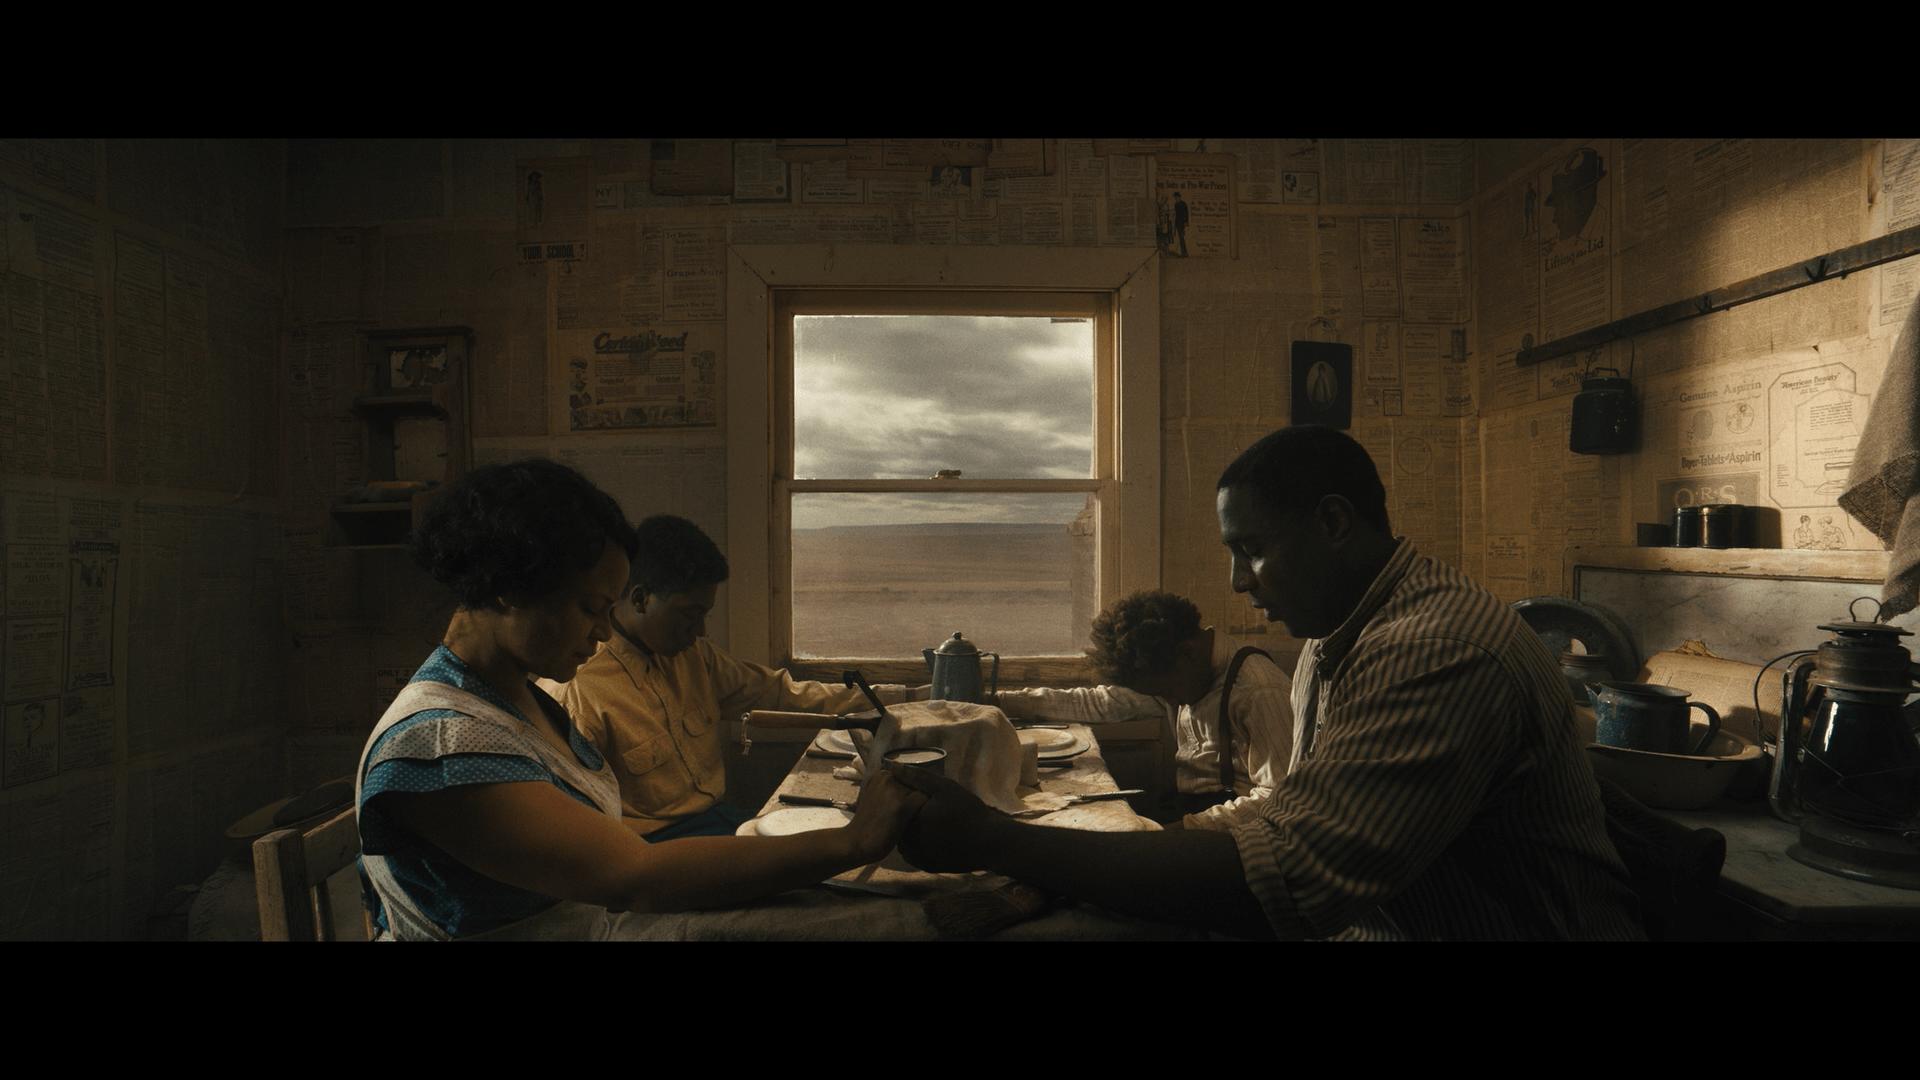 Dreamland (2019) [Merkin Fantasy Film Review] 8